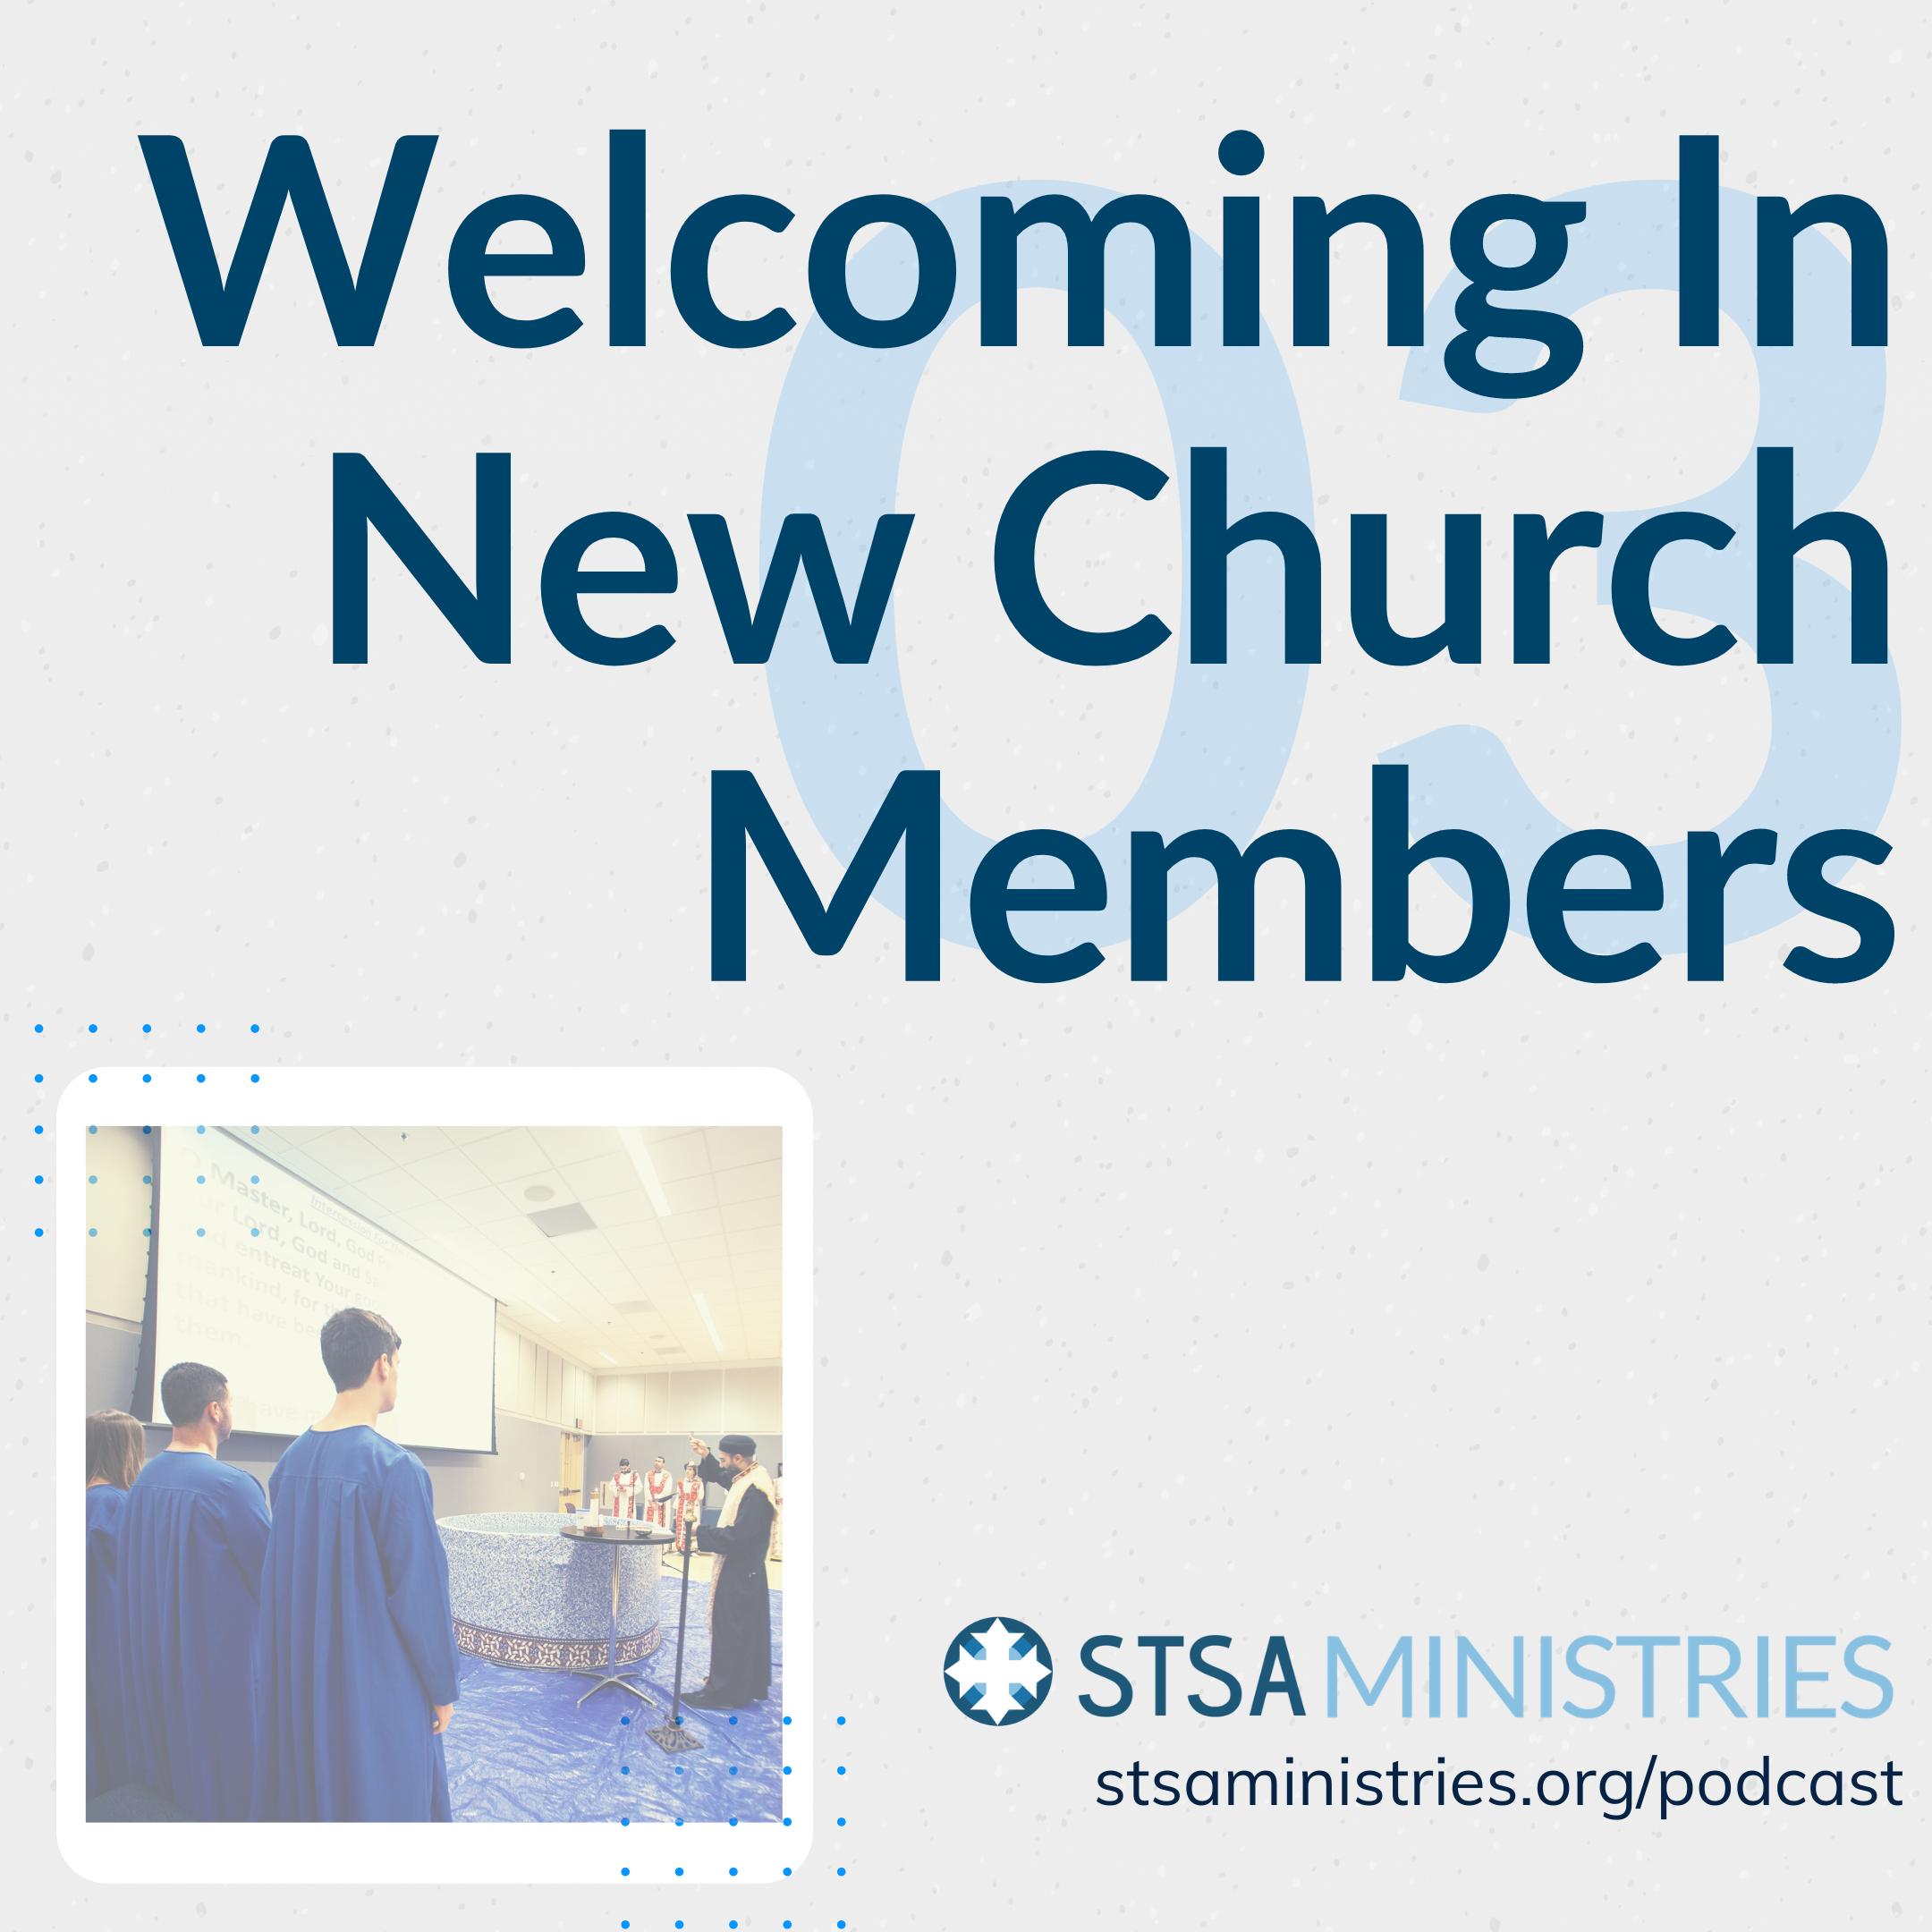 Welcoming In New Church Members